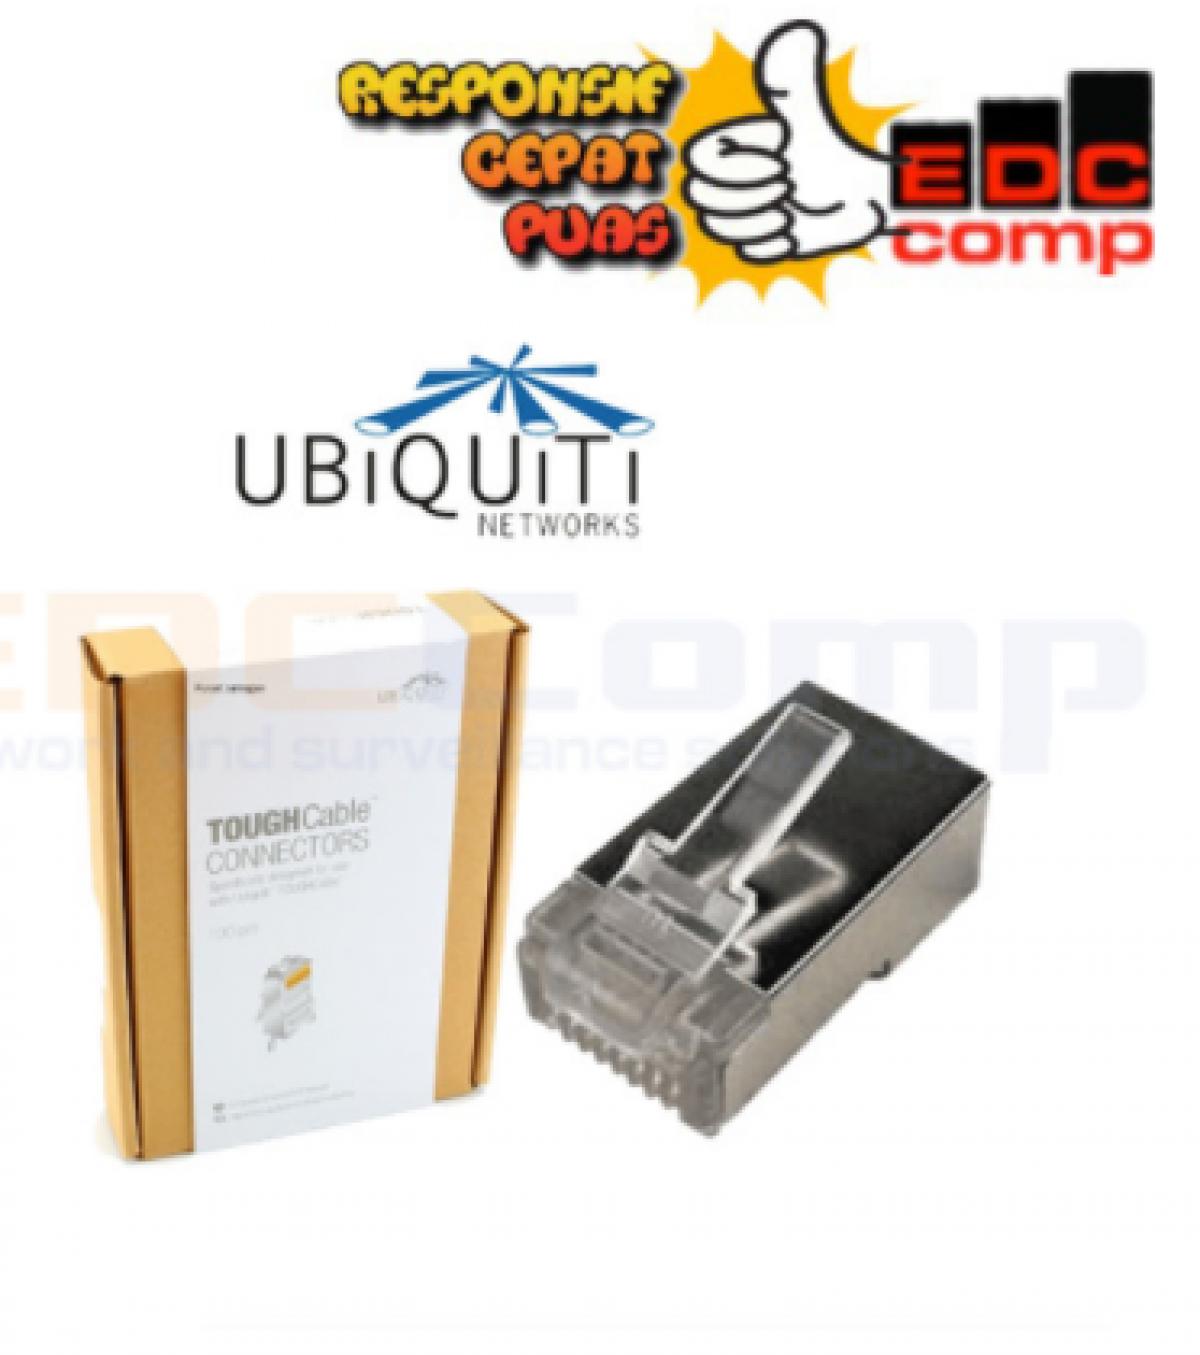 Ubiquiti TC-CON-100 Tough Connector STP - EdcComp